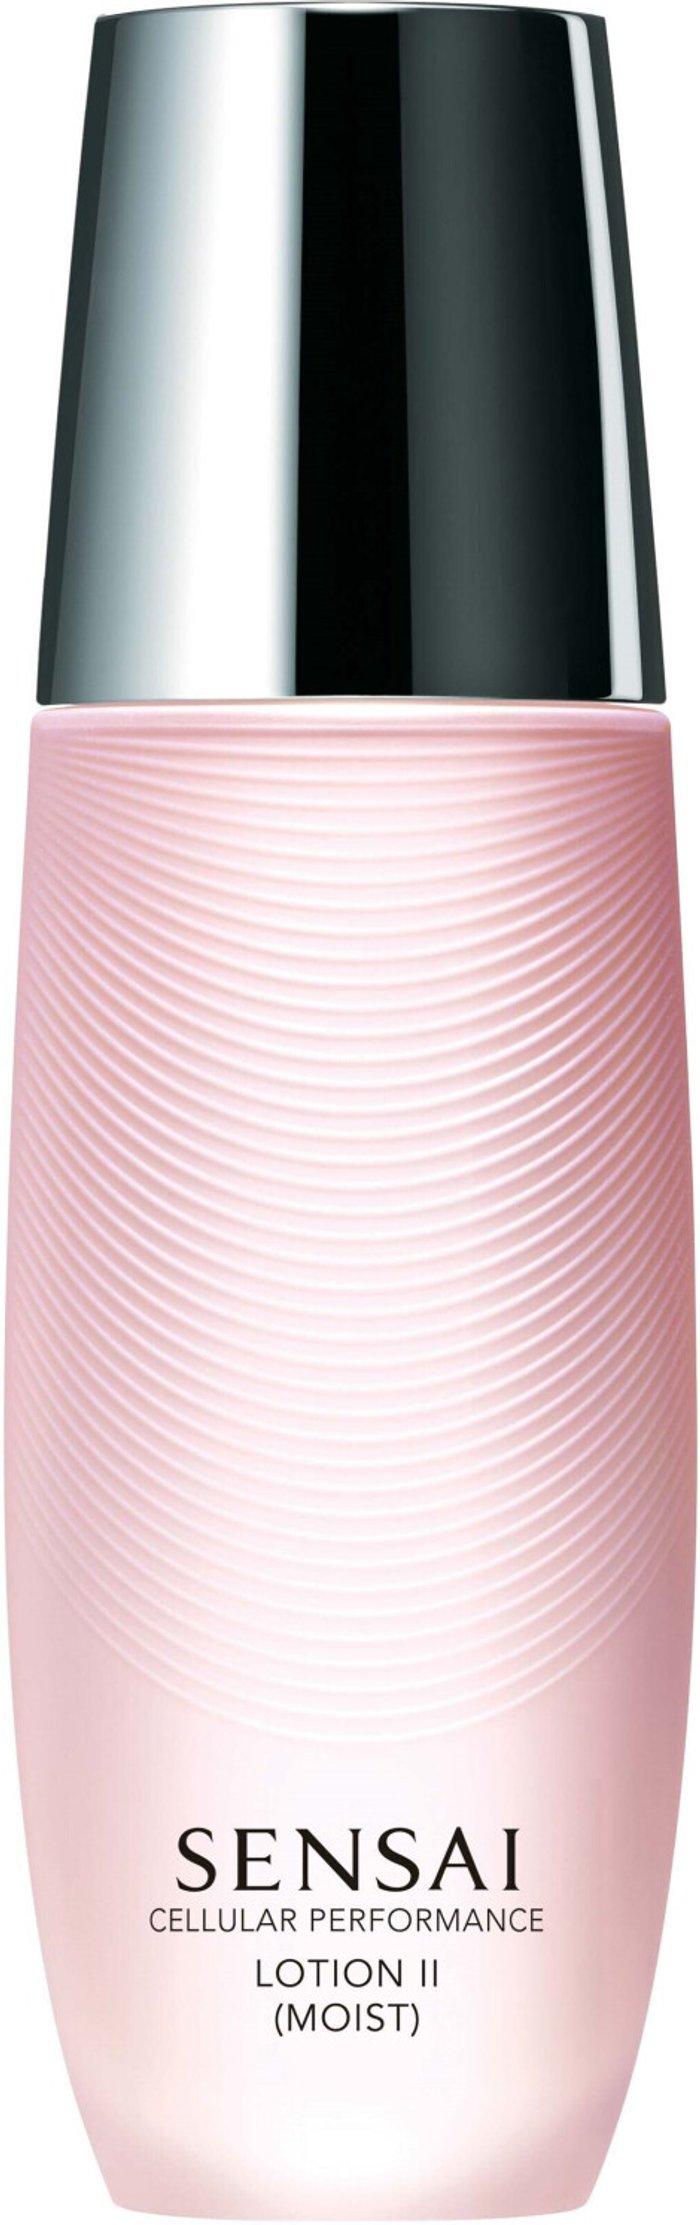 Kanebo Kanebo Sensai Cellular Lotion II (Moist) (125ml)